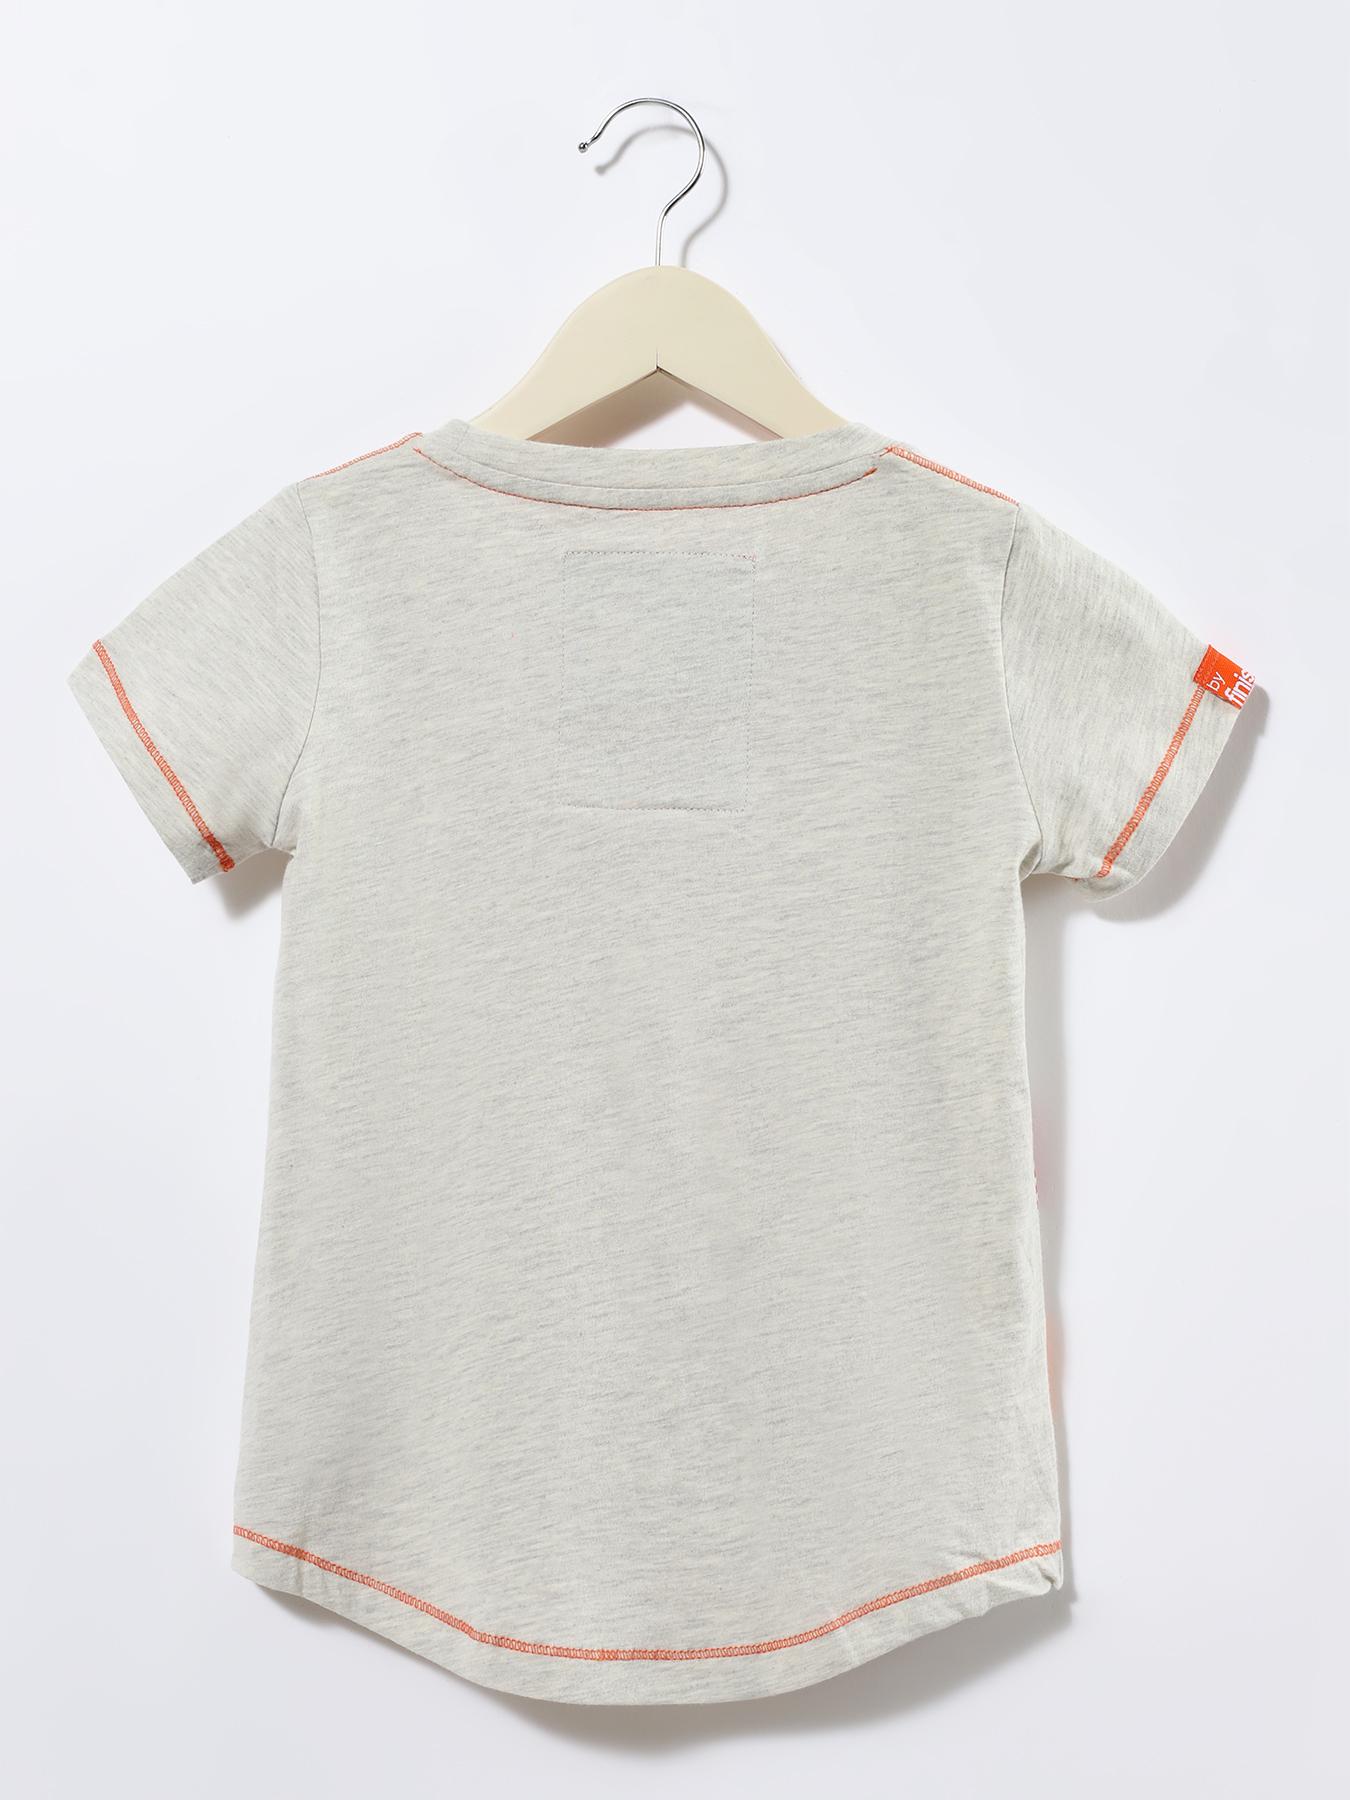 Фуфайка Finisterre Футболка с принтом футболка с принтом 1 мес 4 лет